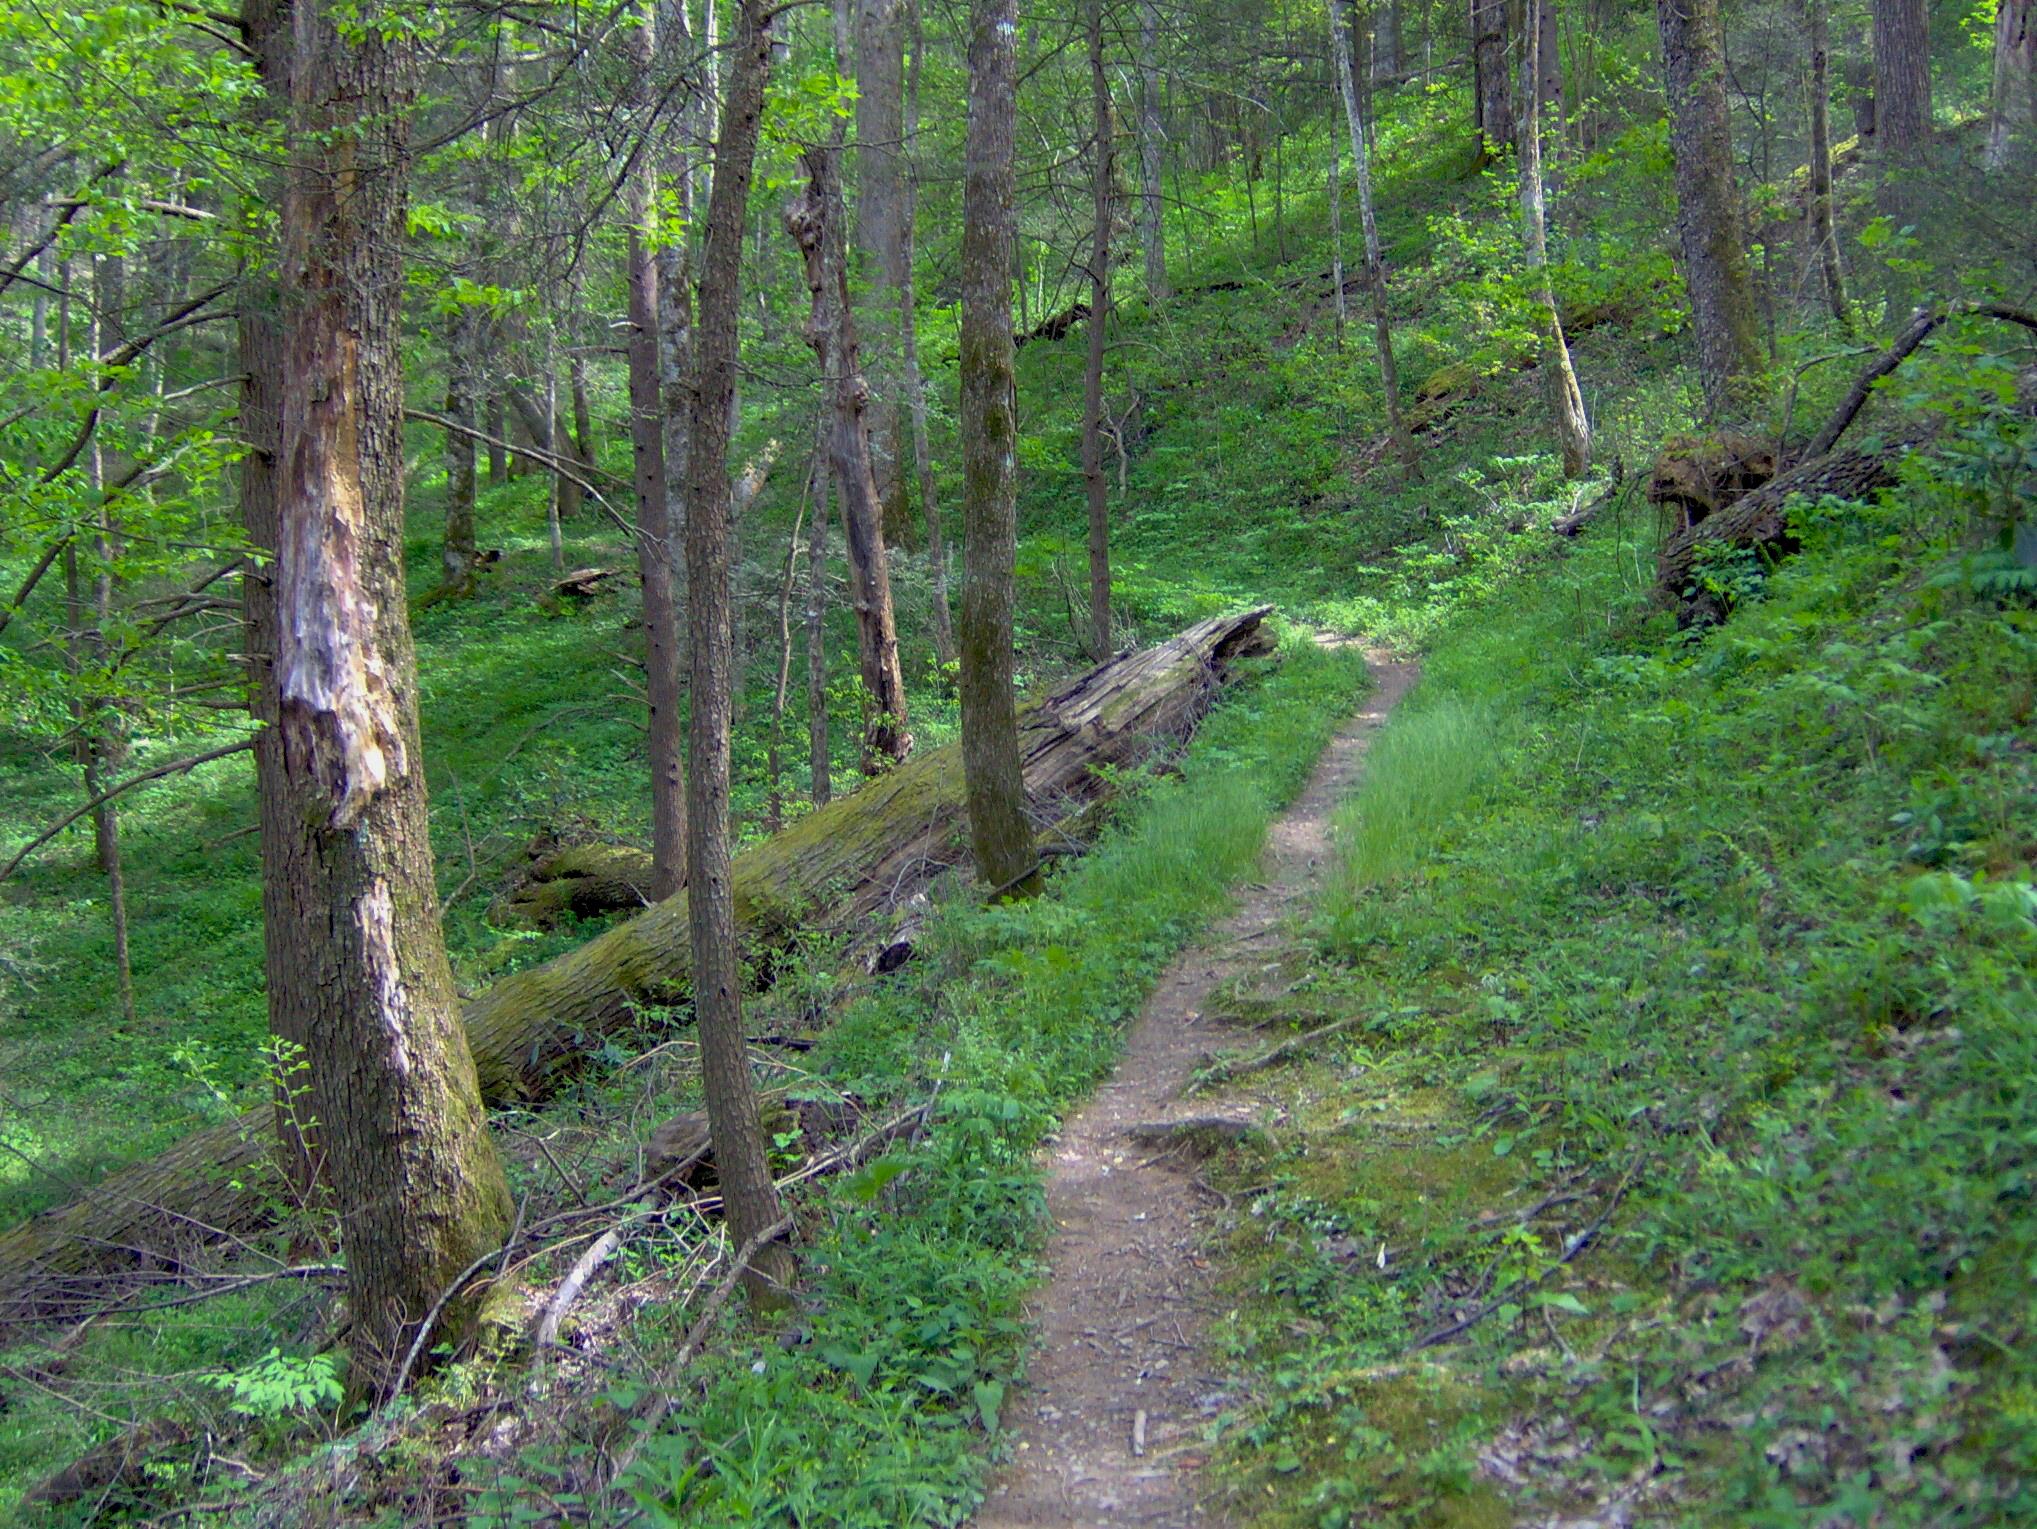 File:Gabes-mountain-trail-gsmnp1.jpg